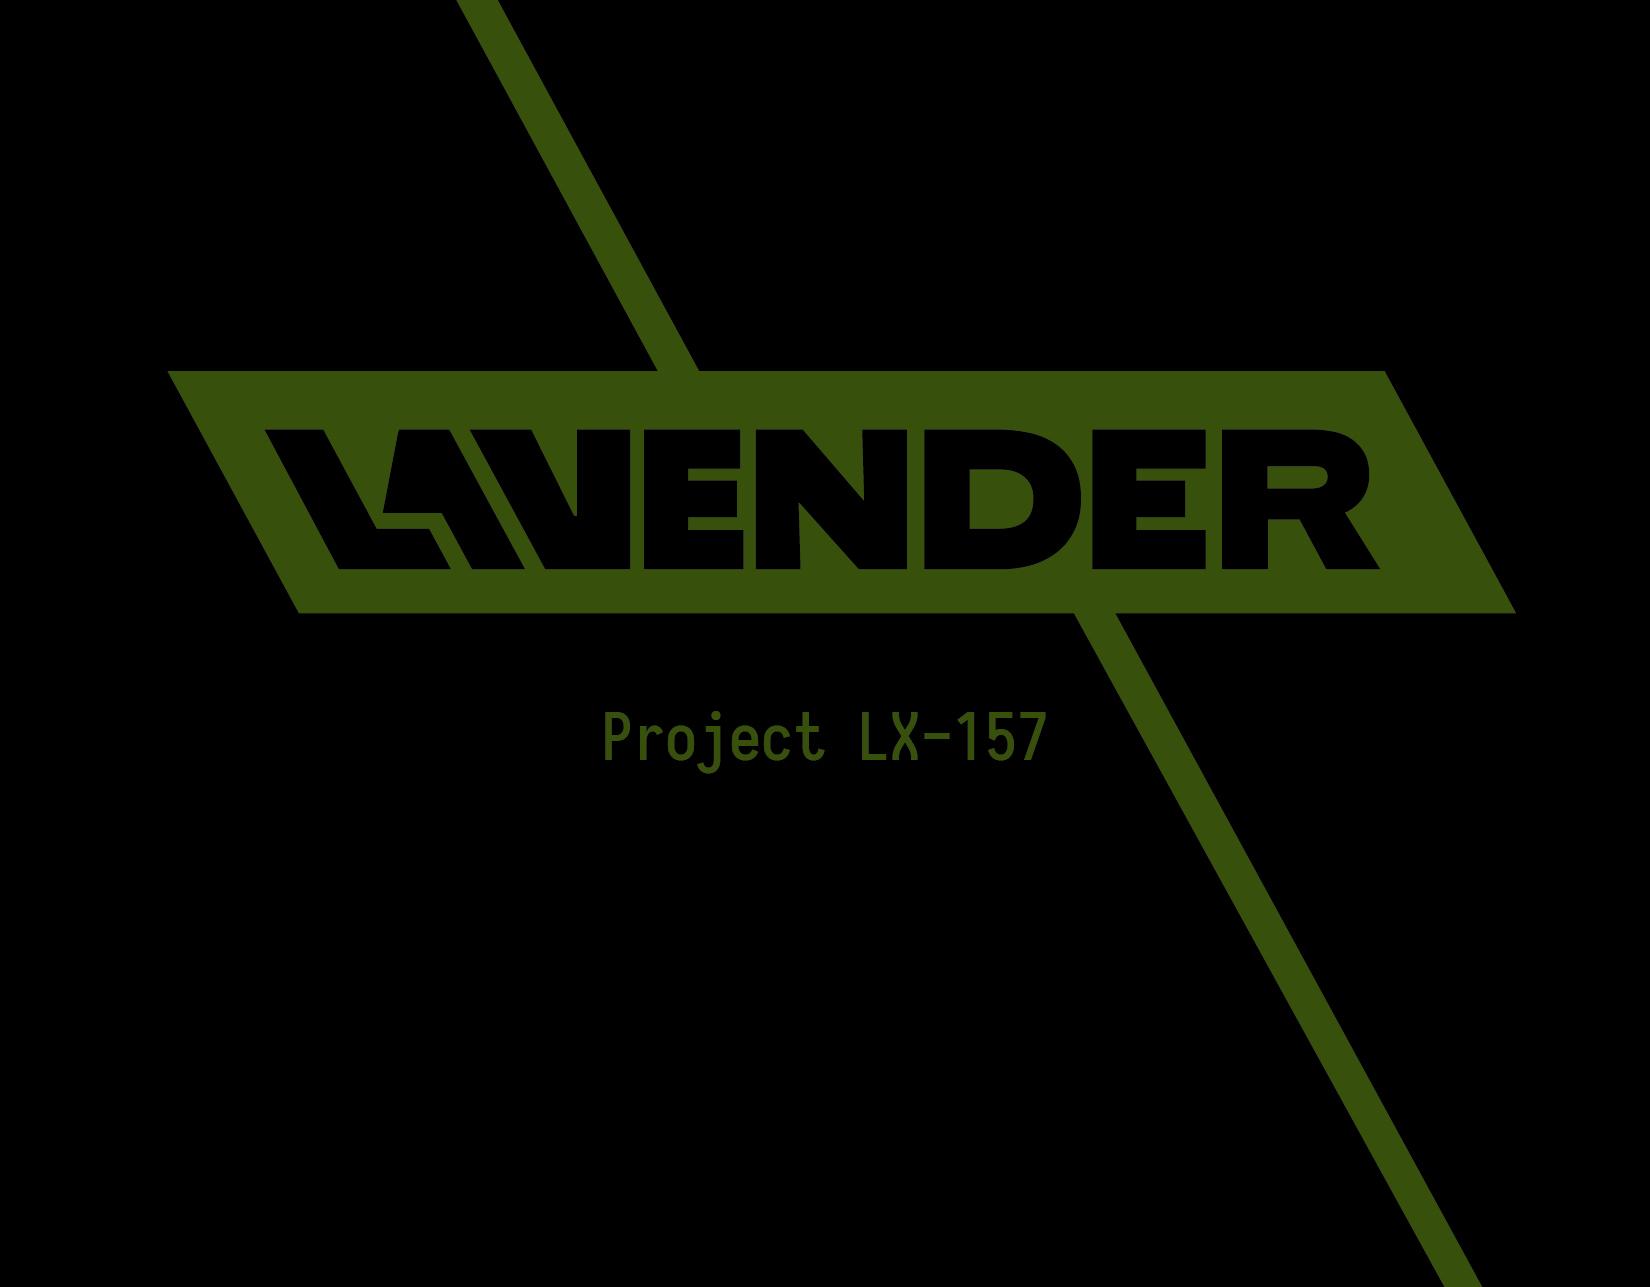 Lavender_Revised-01